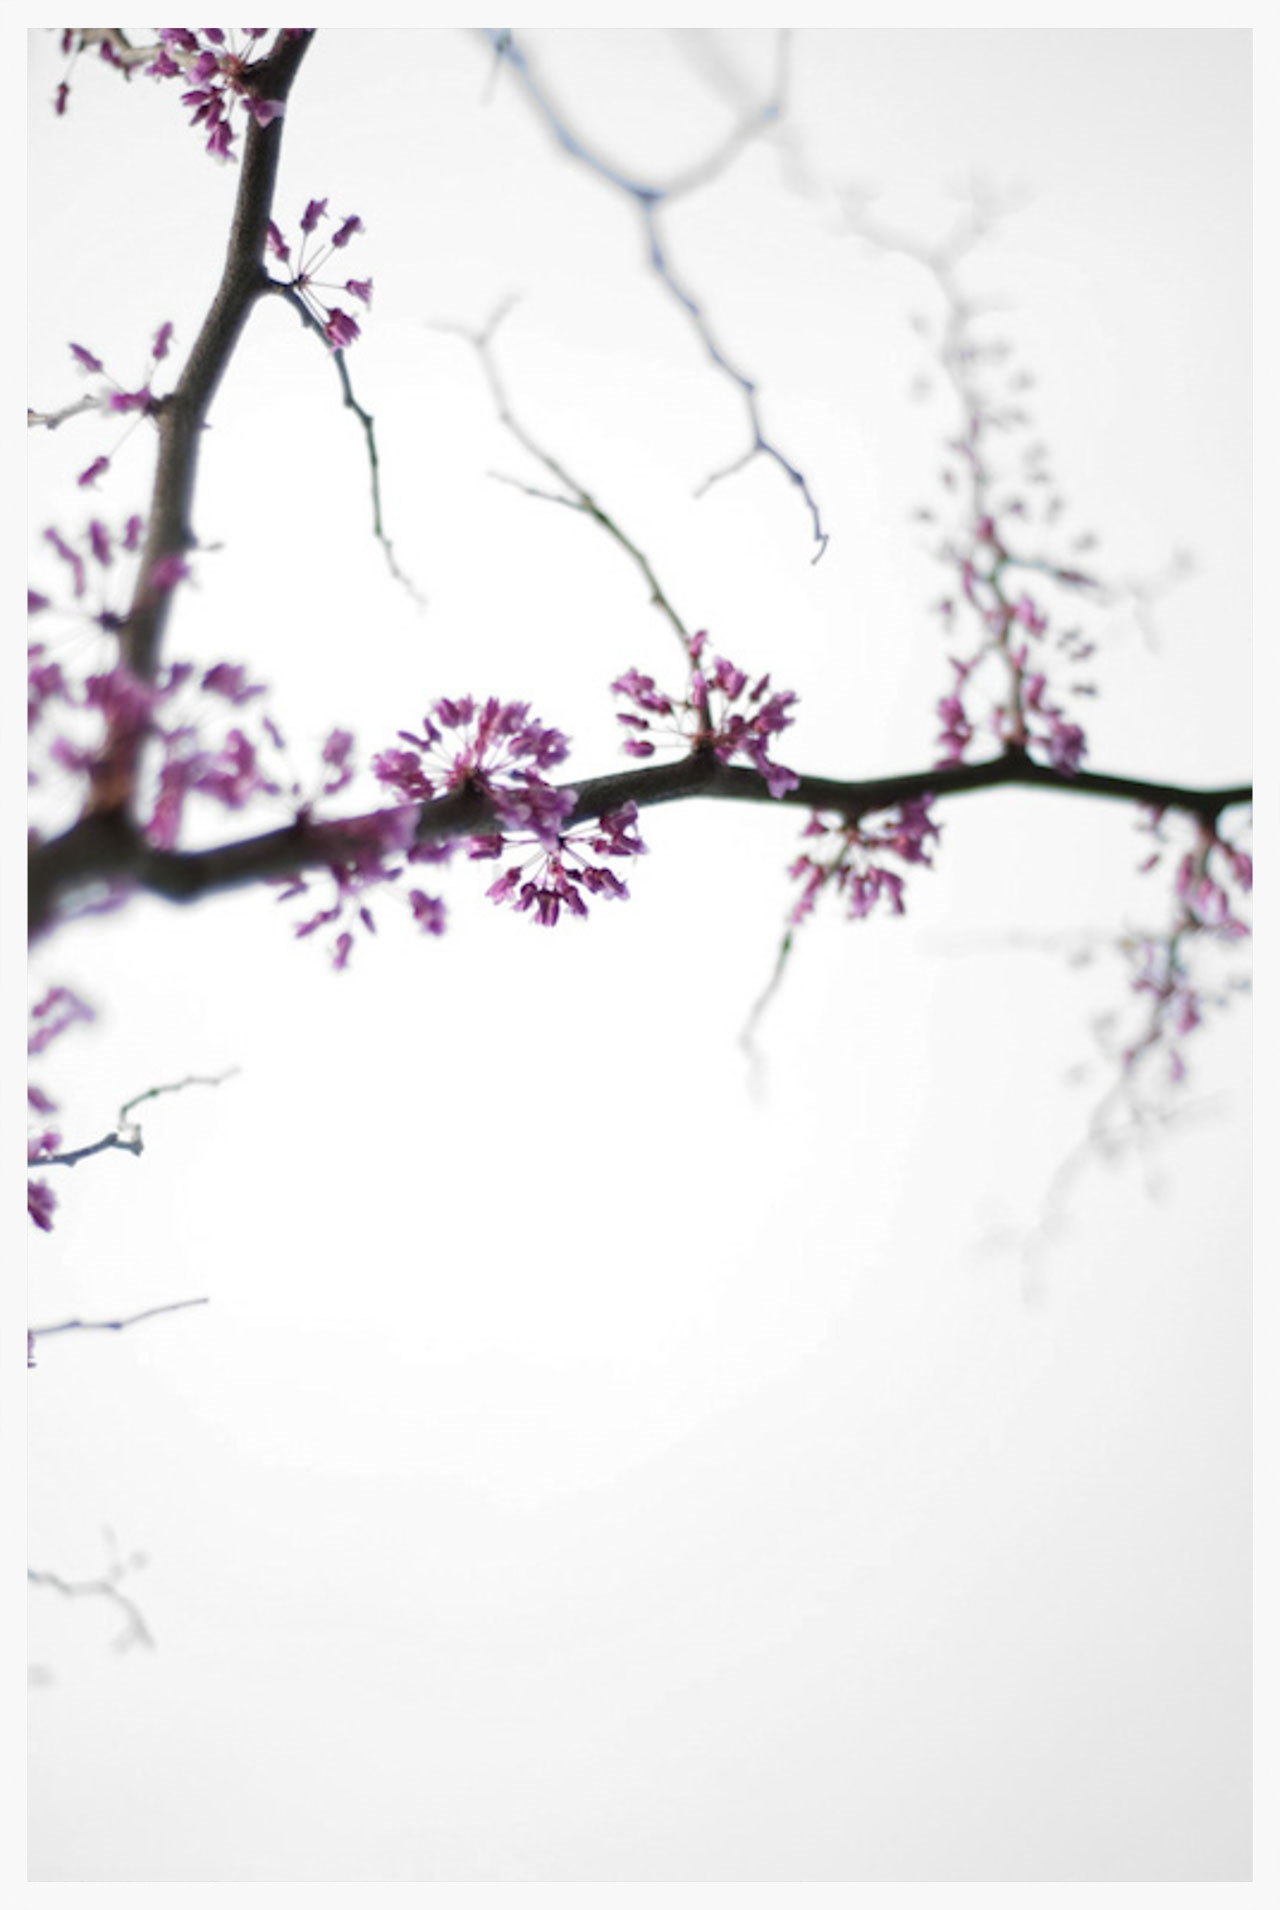 30 Days in Spring-5.jpg